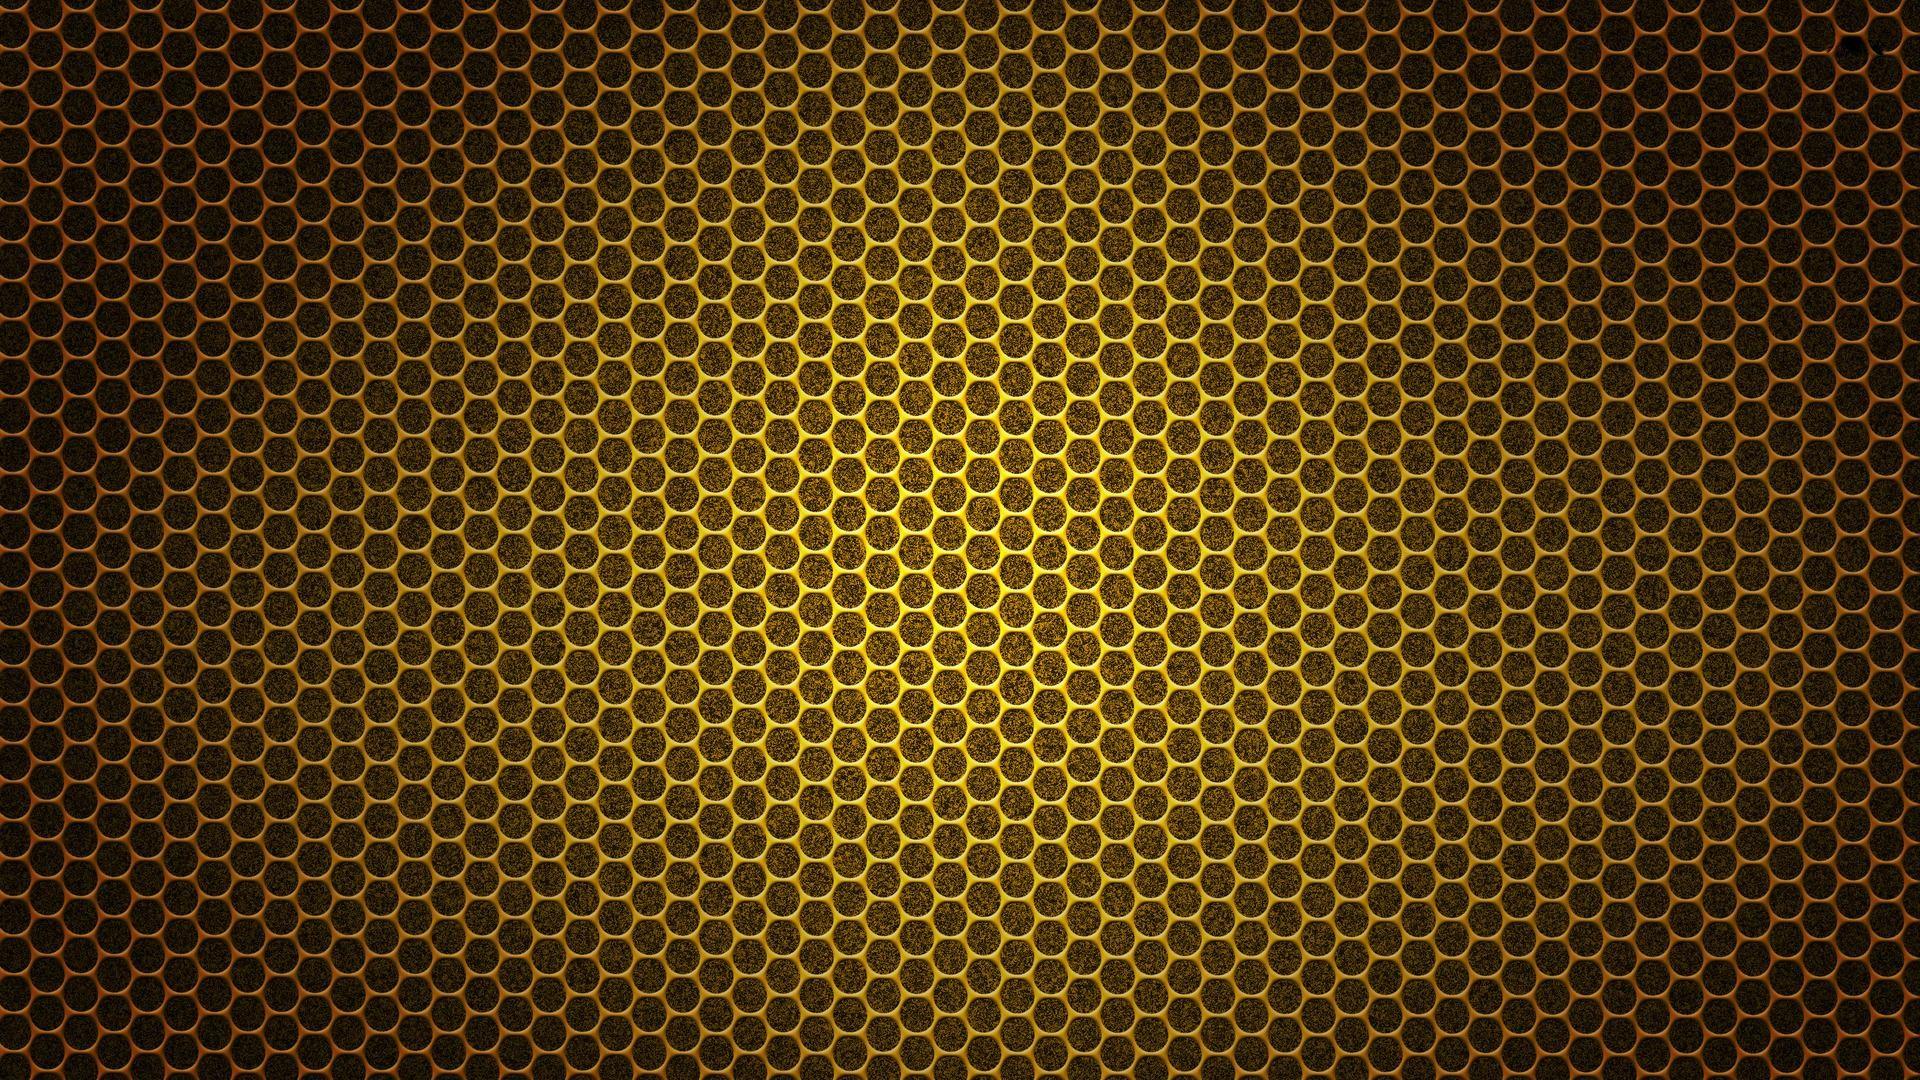 Gold-pattern-desktop-background-wallpapers